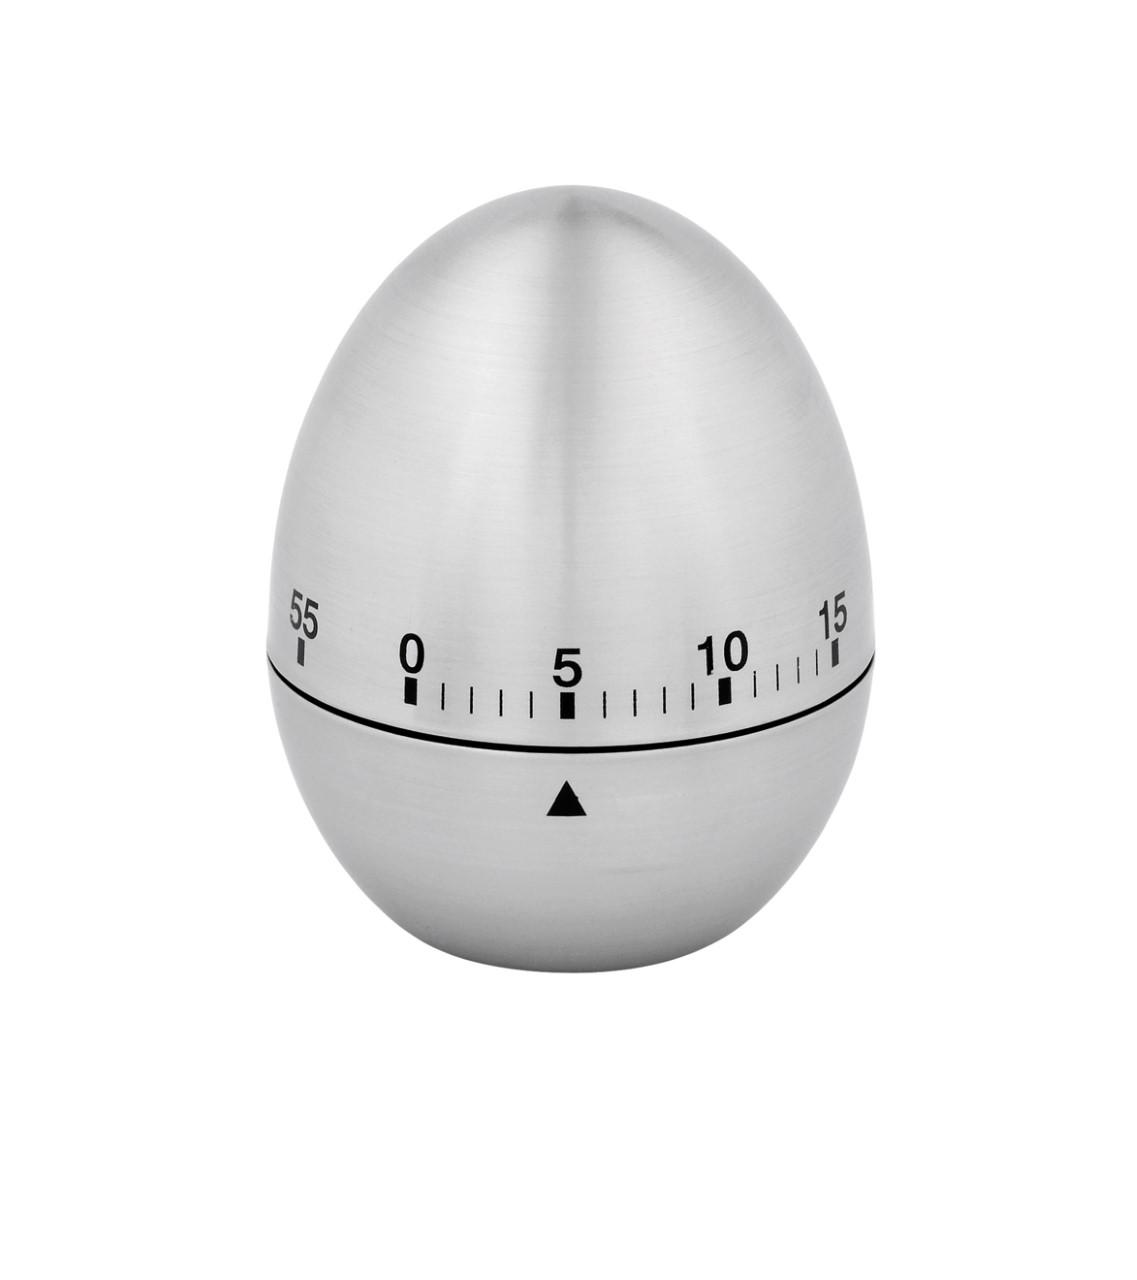 obrazok Časovač kuchynské vajíčko Egg - Reklamnepredmety